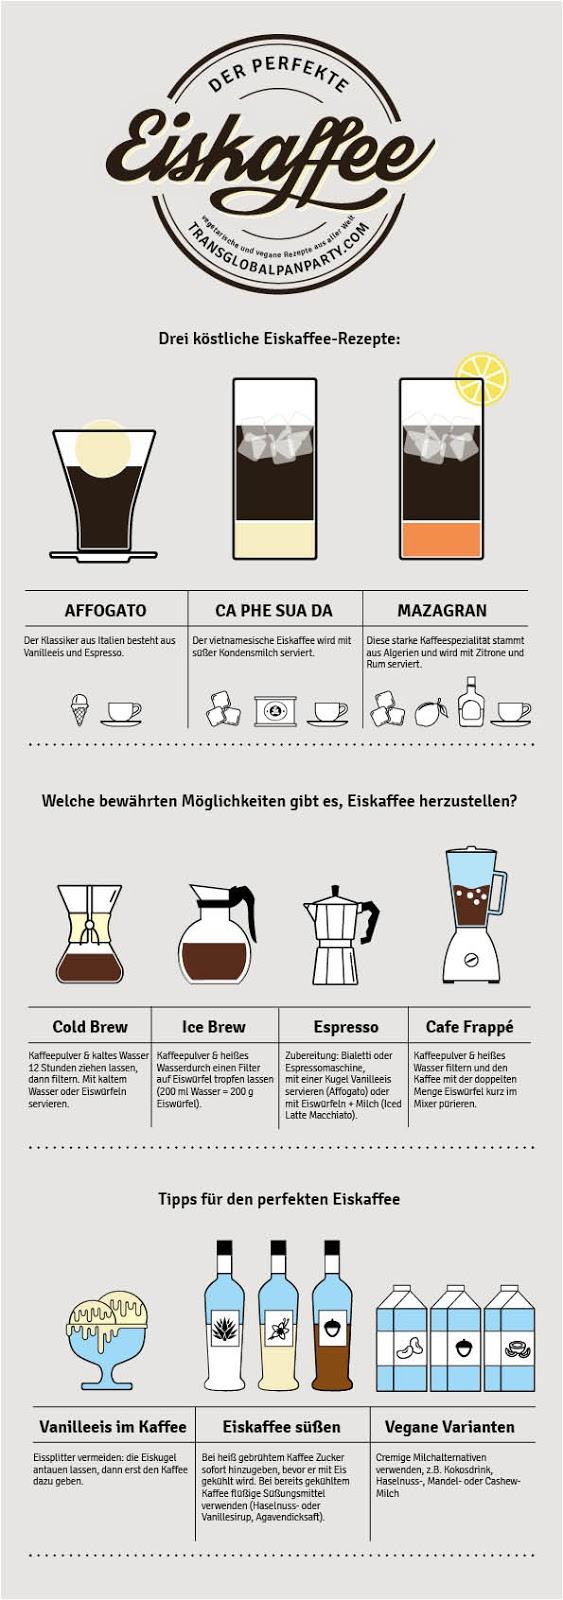 Der perfekte Eiskaffee Infografik